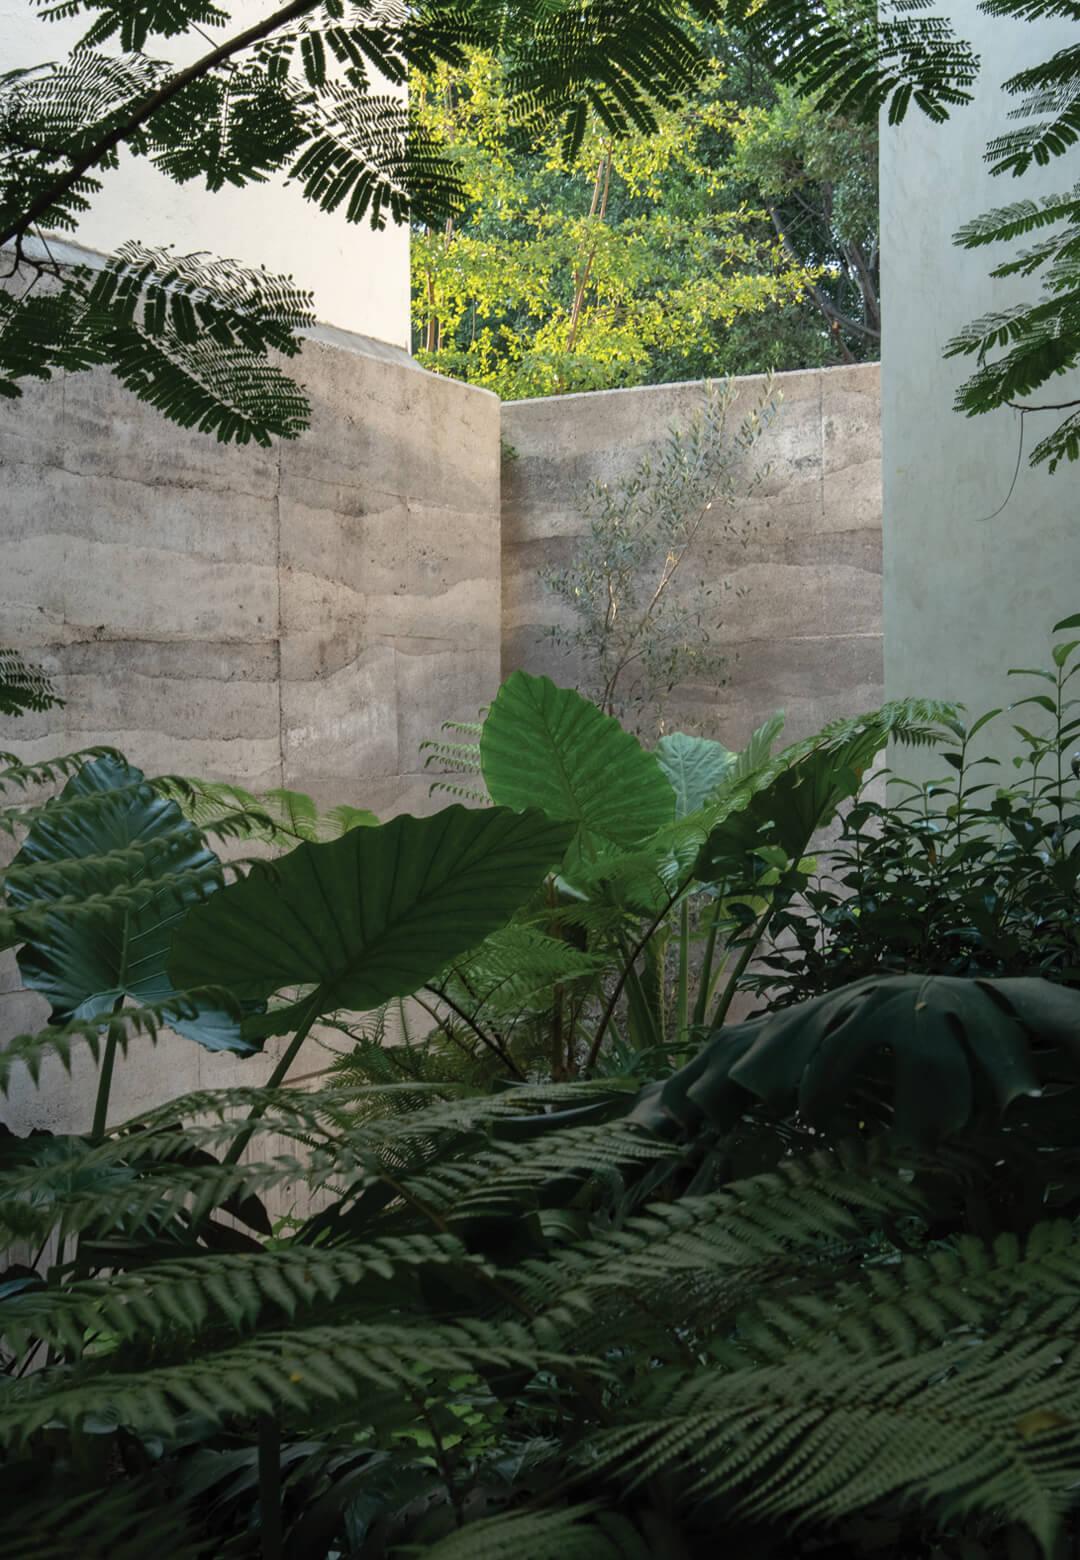 Casa Duraznos in Mexico designed by V Taller draws inspiration from hacienda architecture | Casa Duraznos designed by V Taller | STIRworld